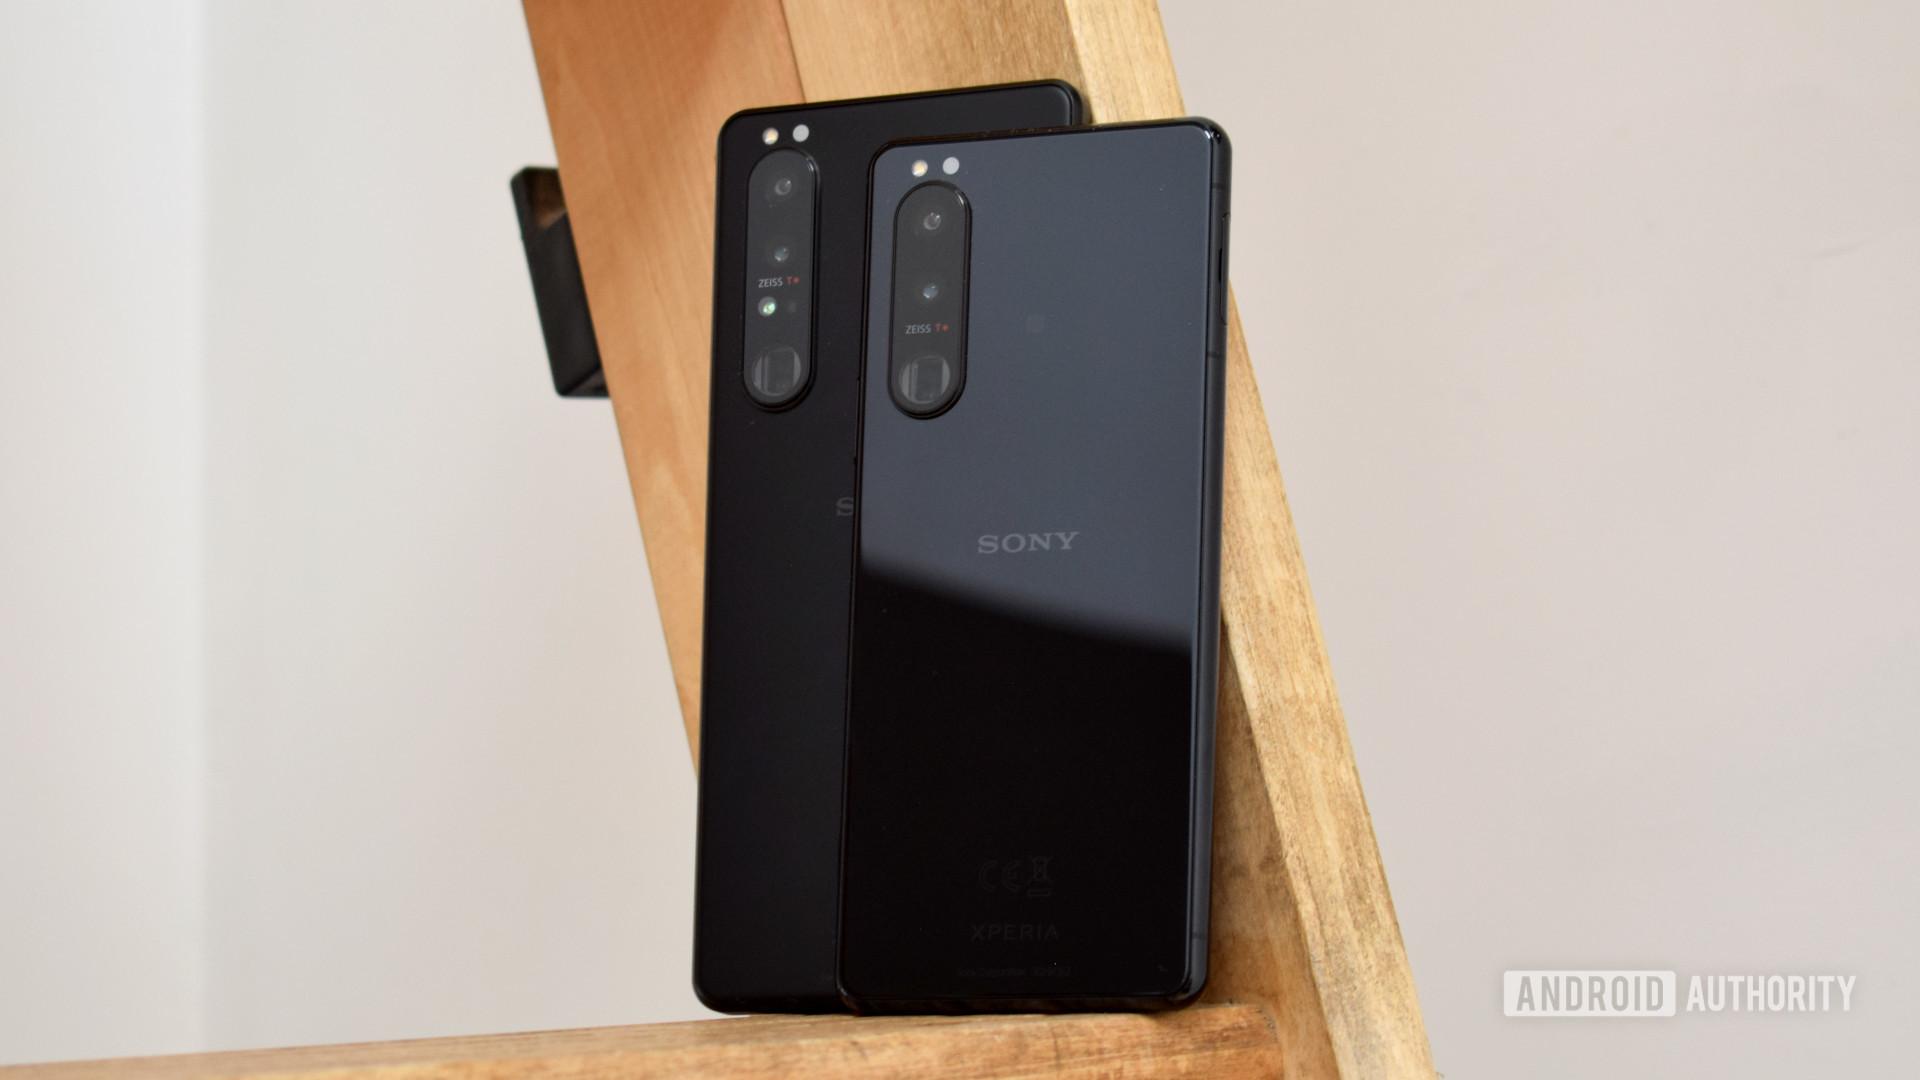 Sony Xperia 1 III vs Sony Xperia 5 III backs stood up